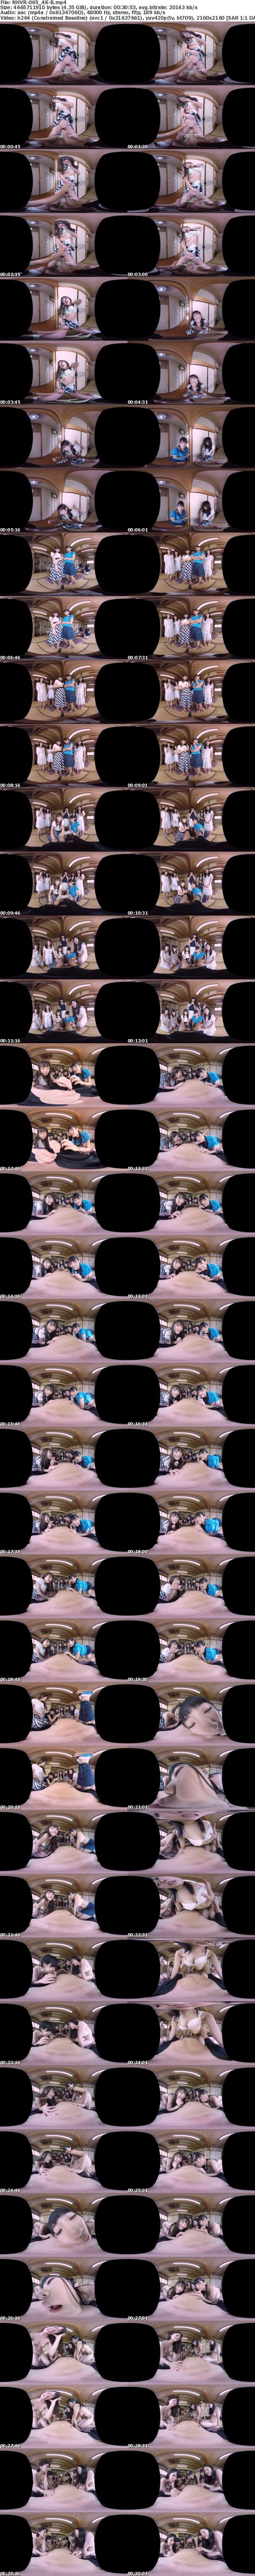 (VR) NHVR-065 同窓会痴● VR